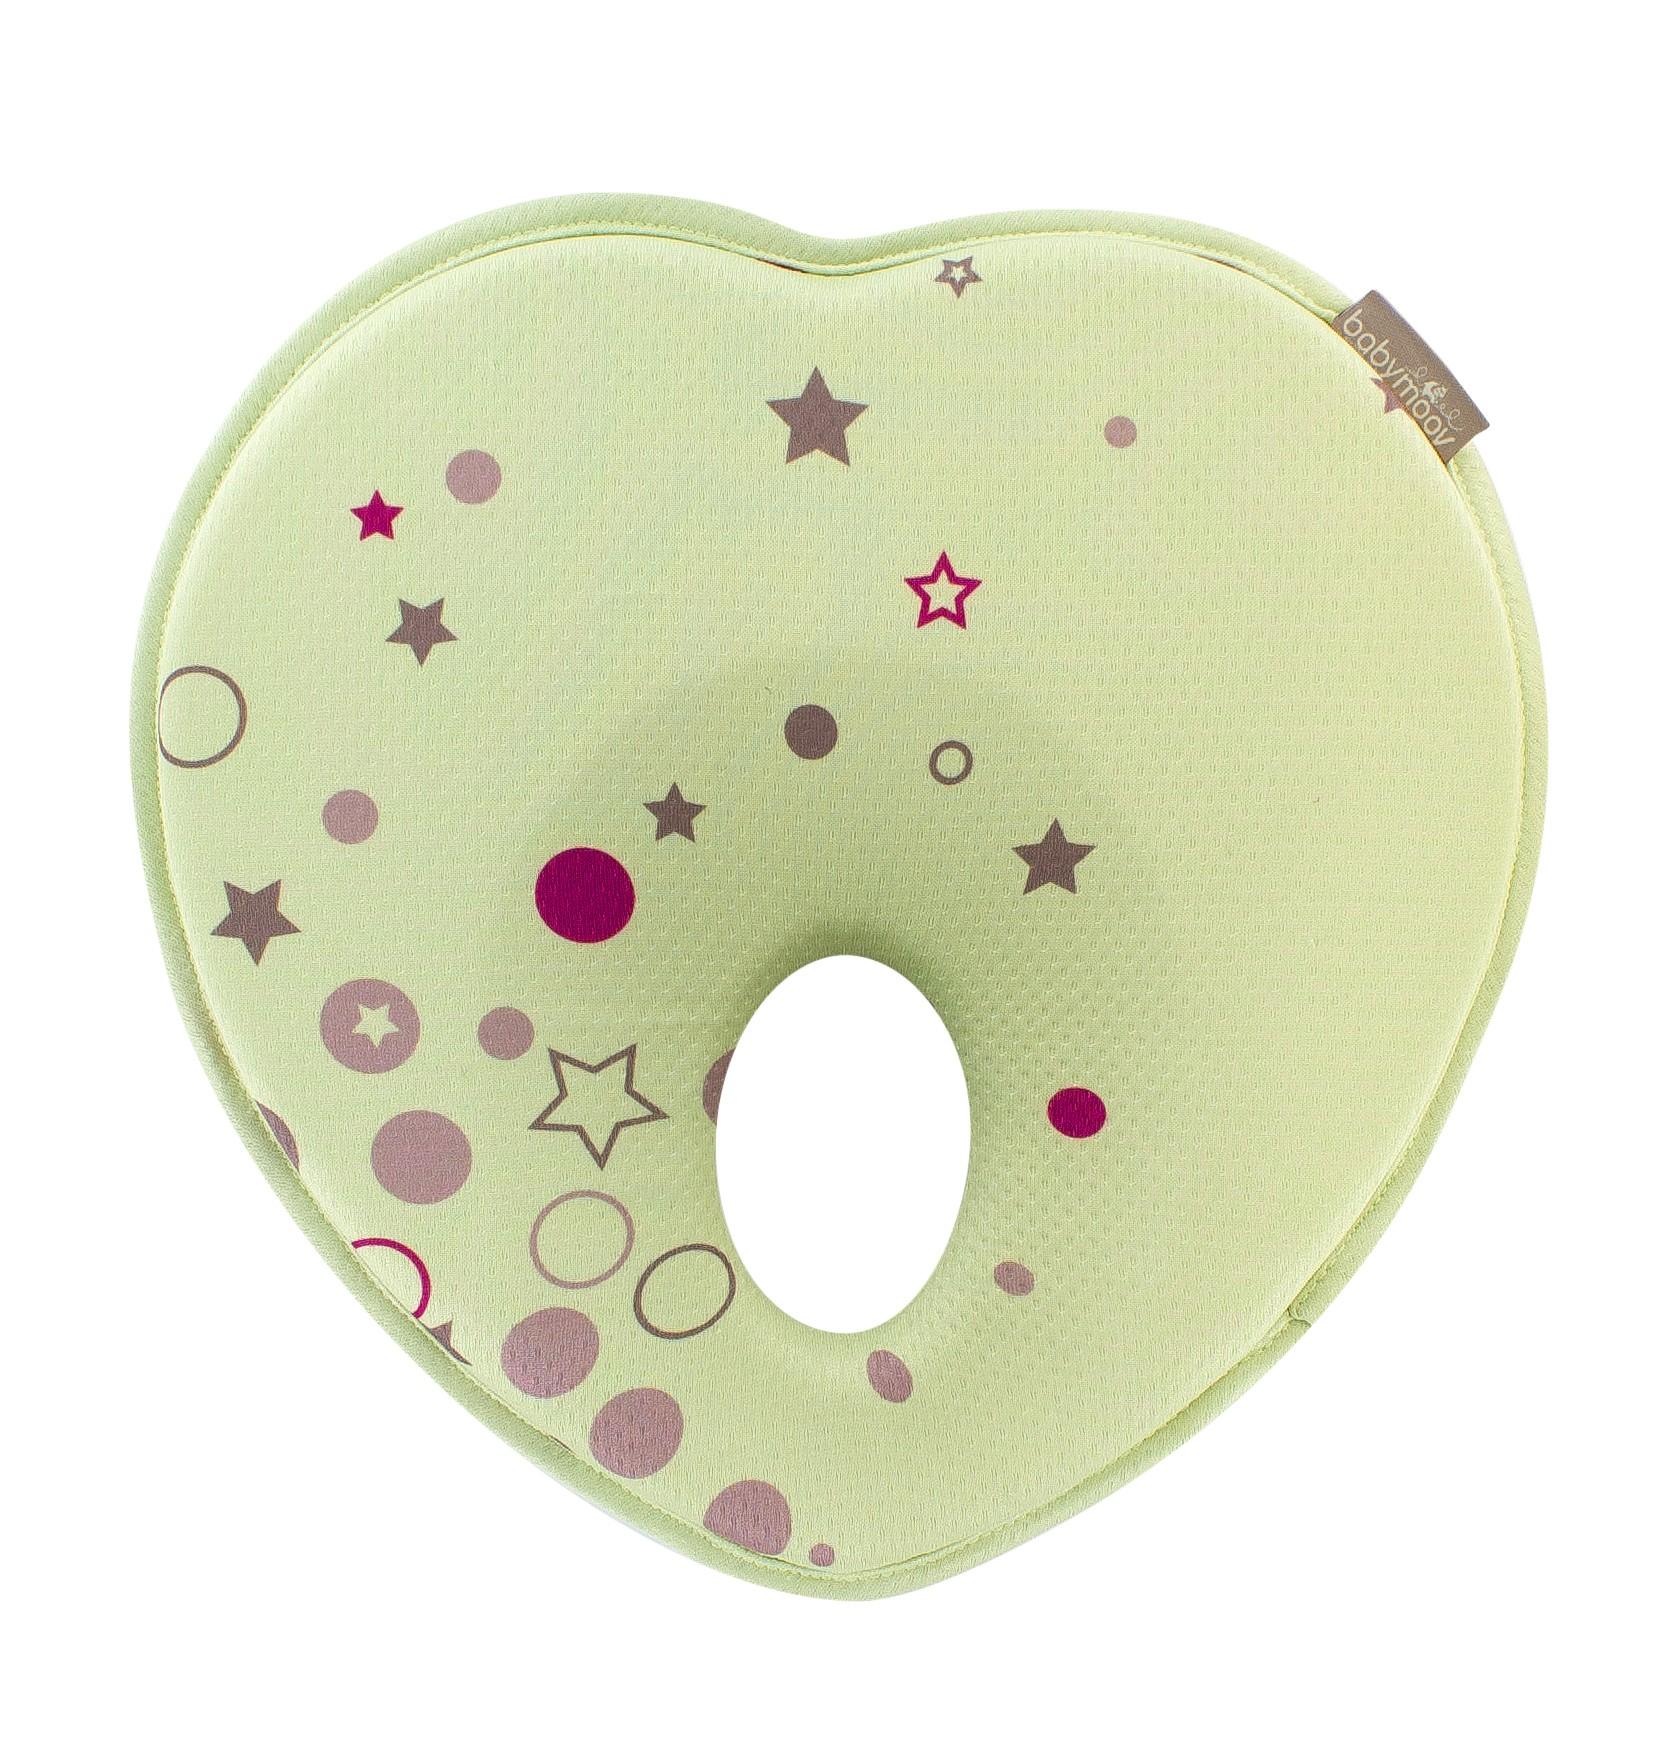 Babymoov Lovenest mandelgrün mit atmungsaktivem Stoff